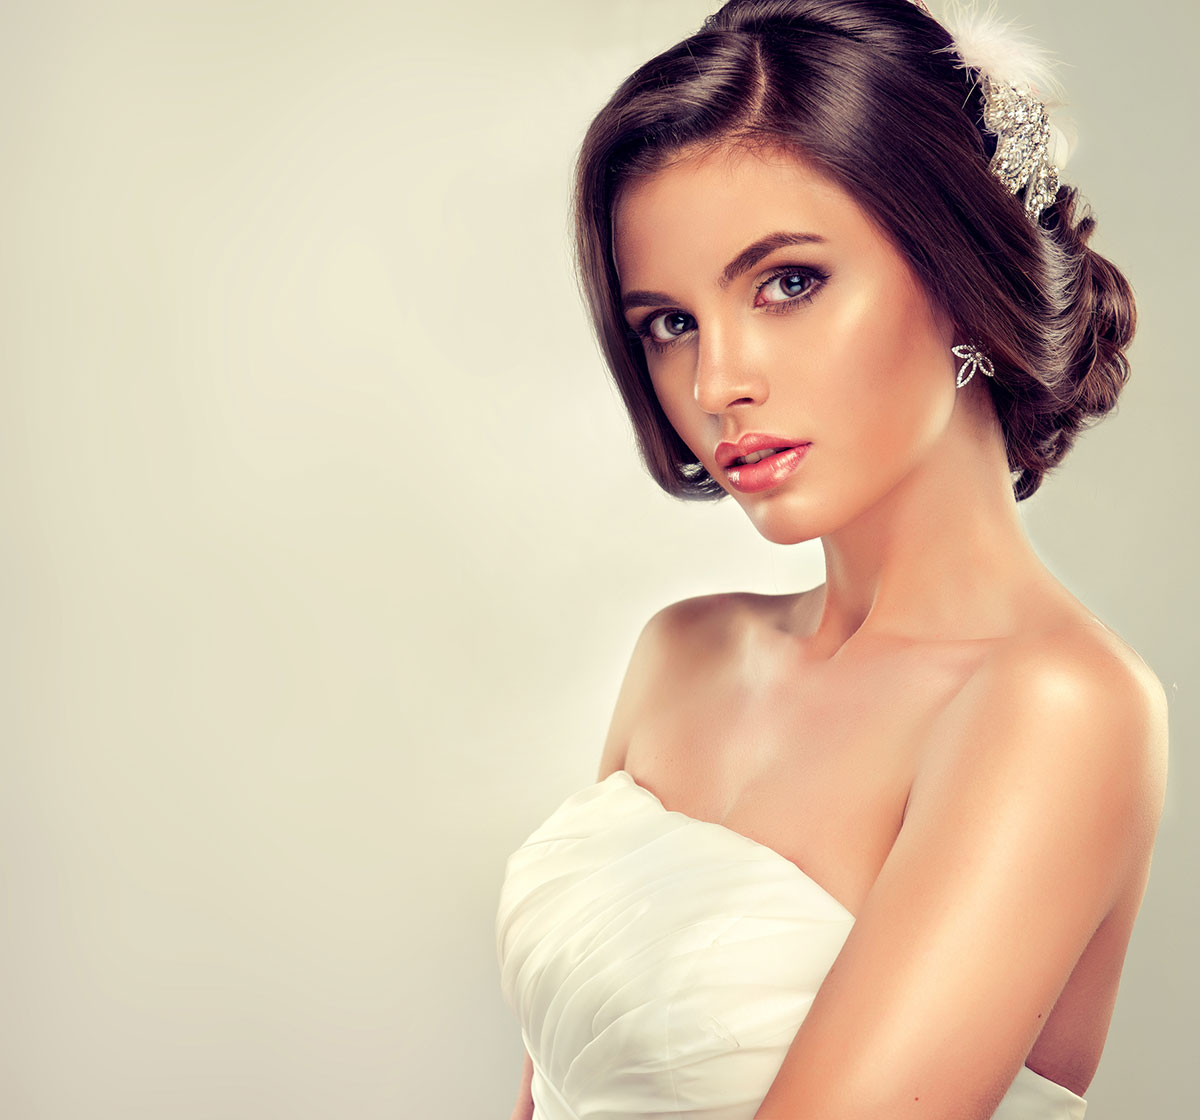 Wedding Makeup Ideas & Wedding Makeup looks - LightUpMirrors.com